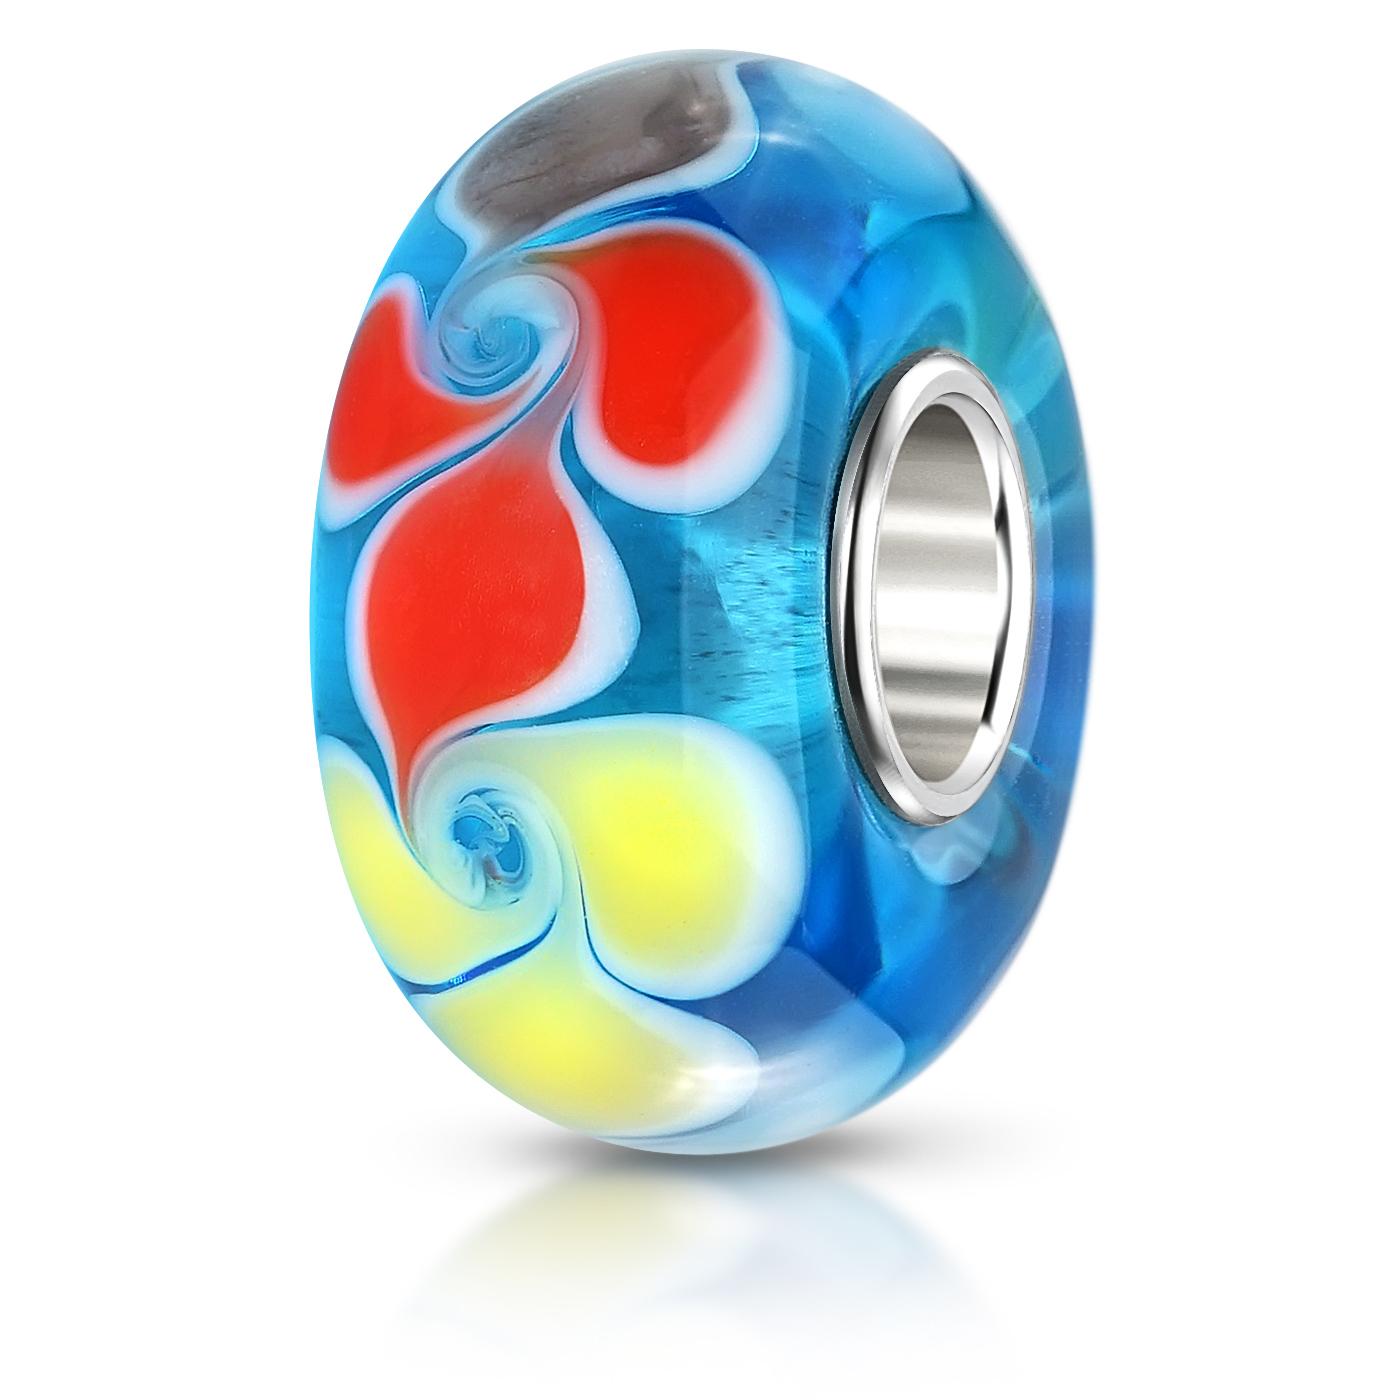 MATERIA 925 Silber Murano Beads Glas Perle blau bunt Element